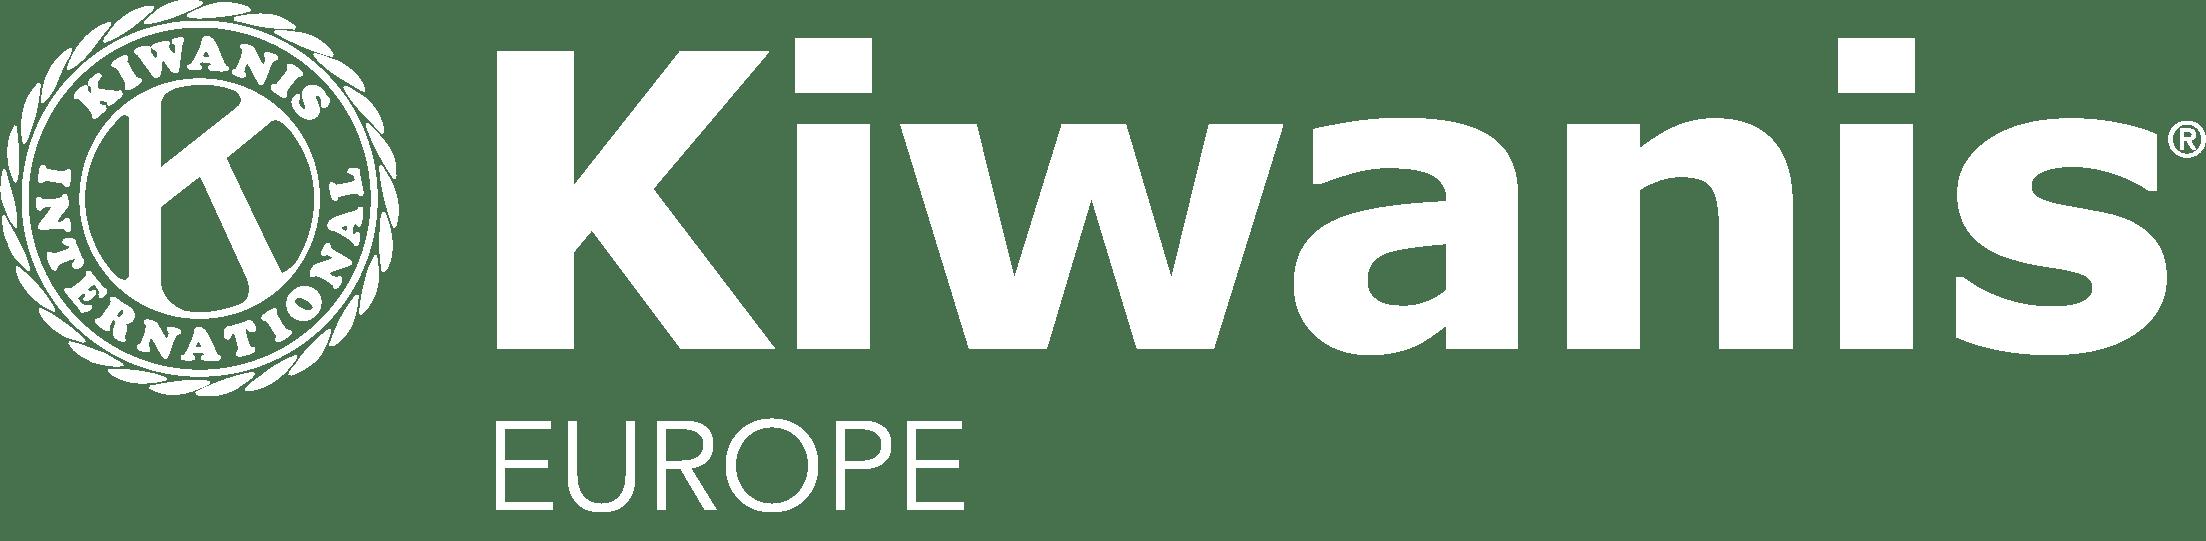 DEVKAP (AWS)